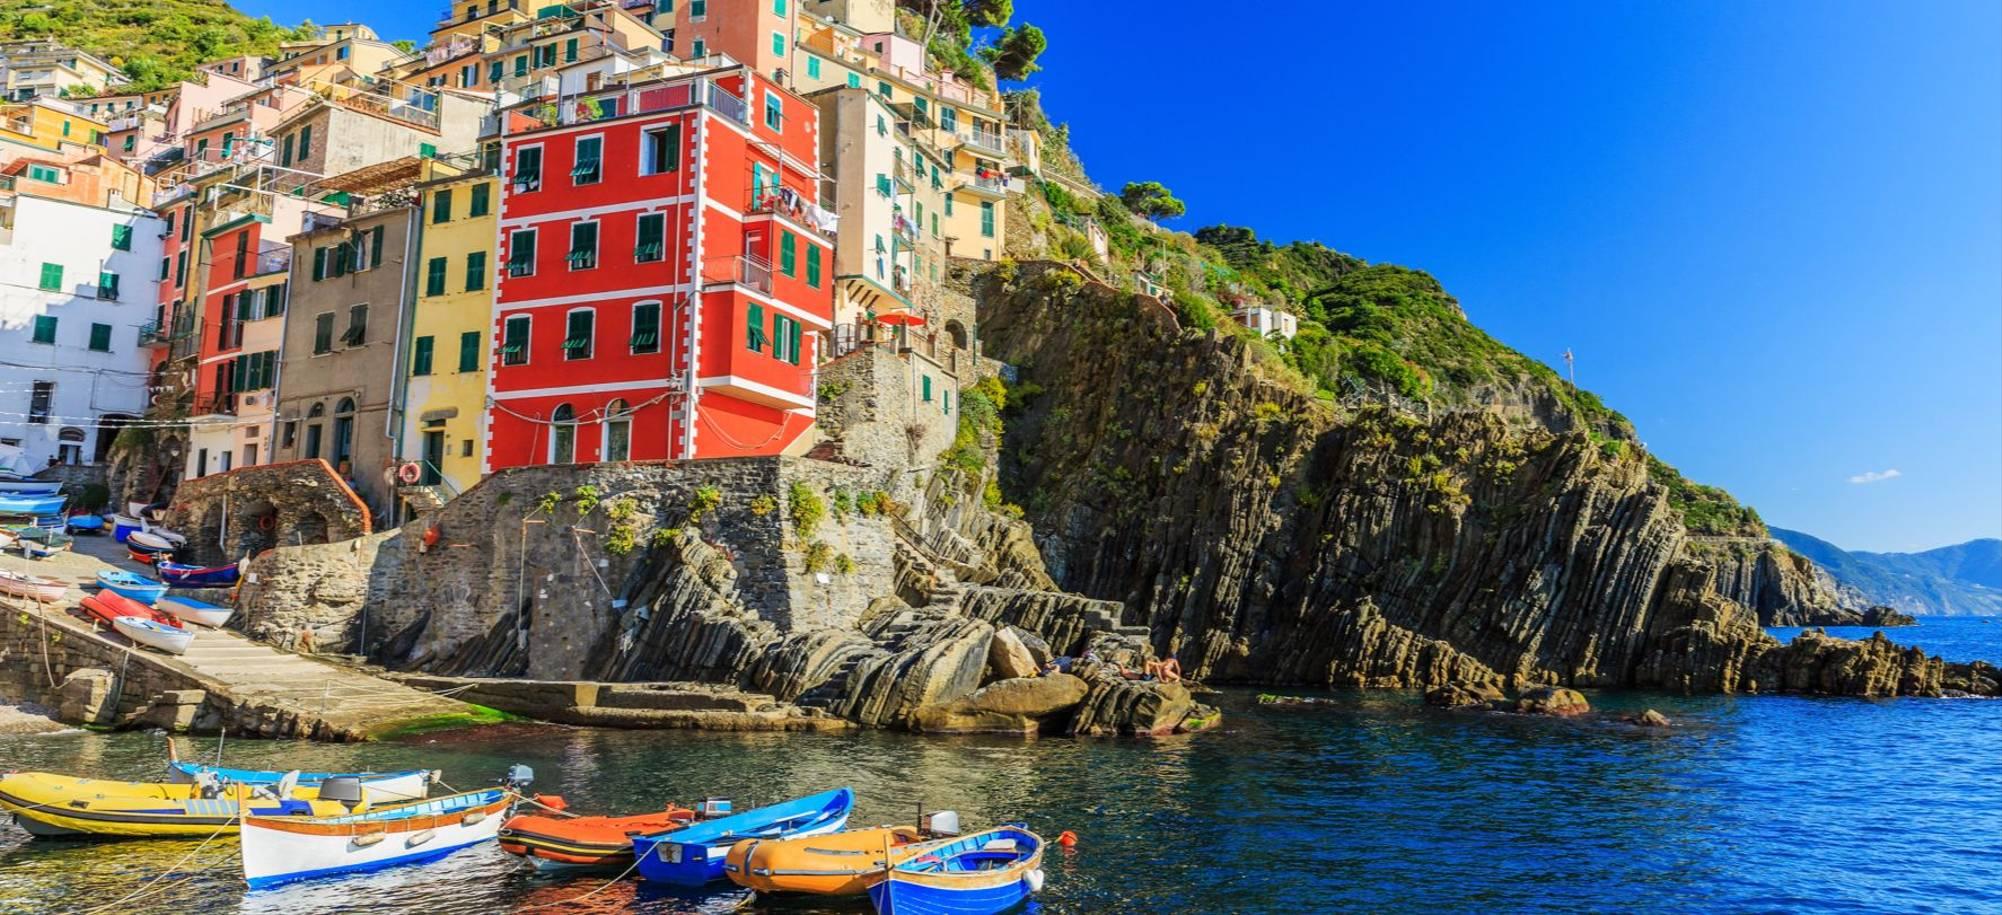 La Spezia - Cinque Terre - Itinerary Desktop .jpg